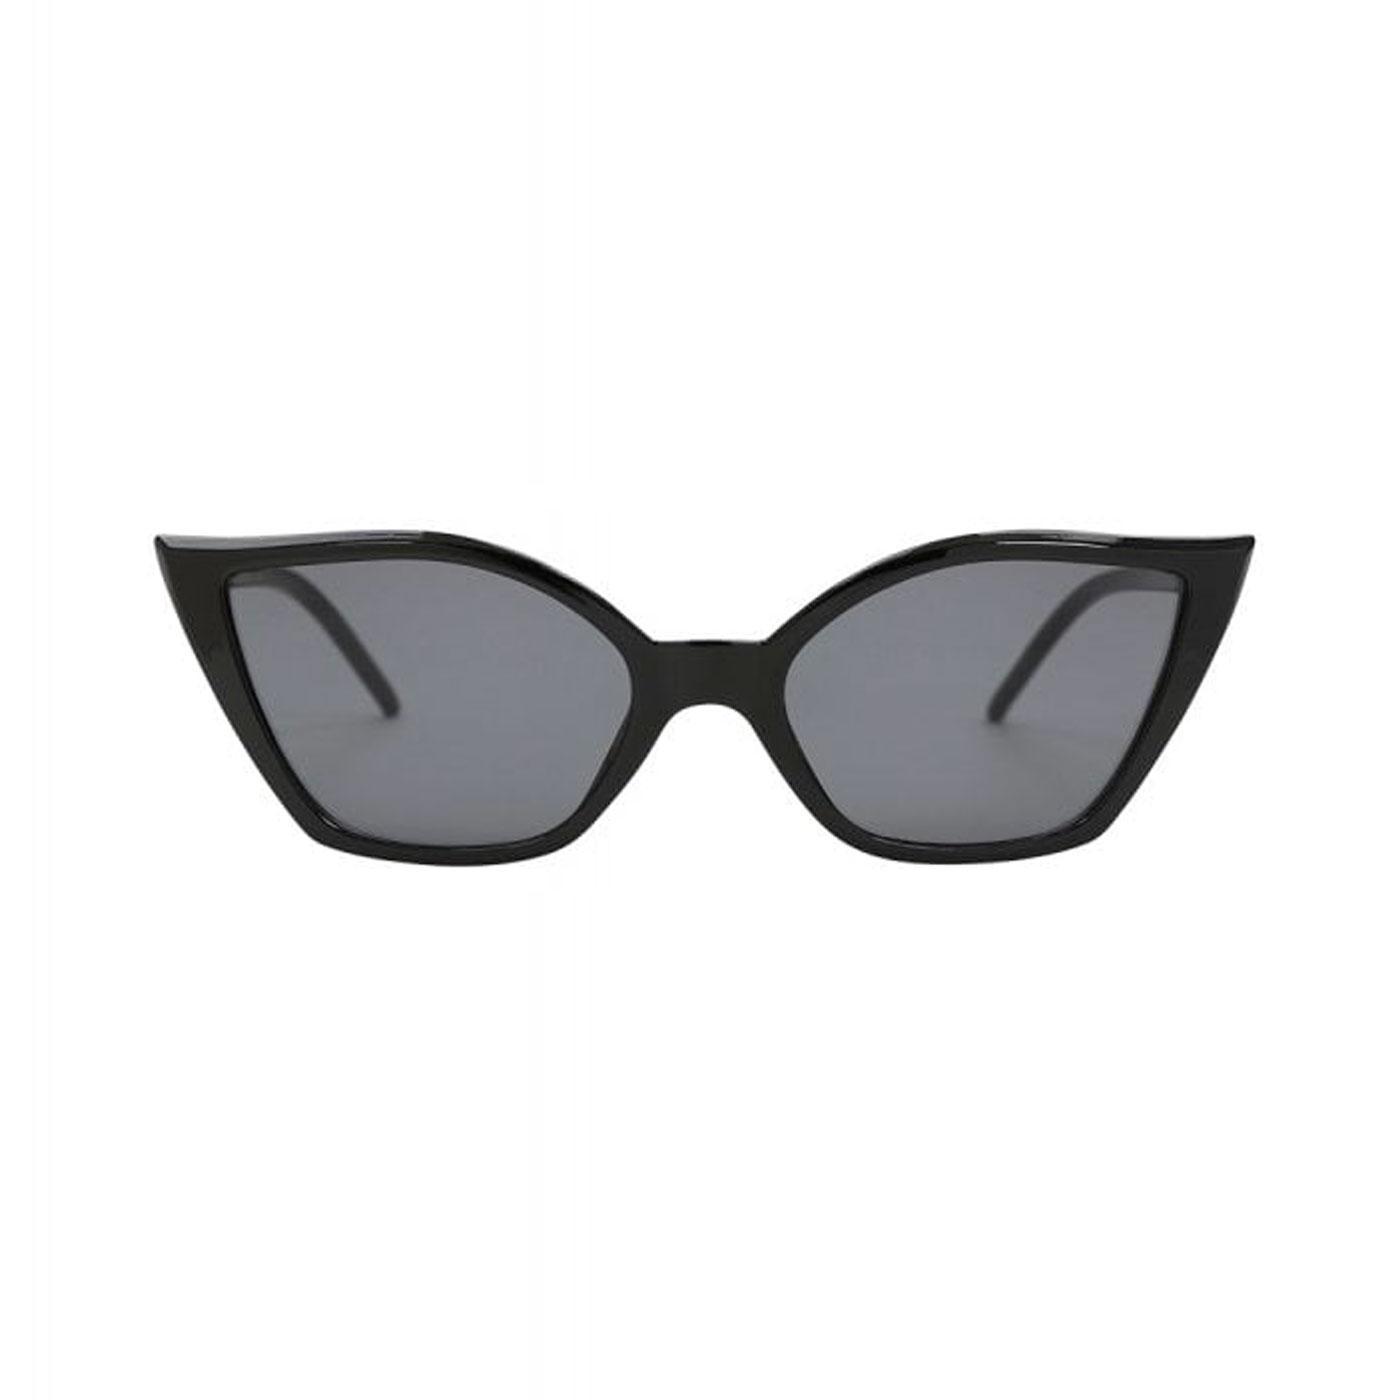 Audrey COLLECTIF Vintage 50s Catseye Sunglasses B